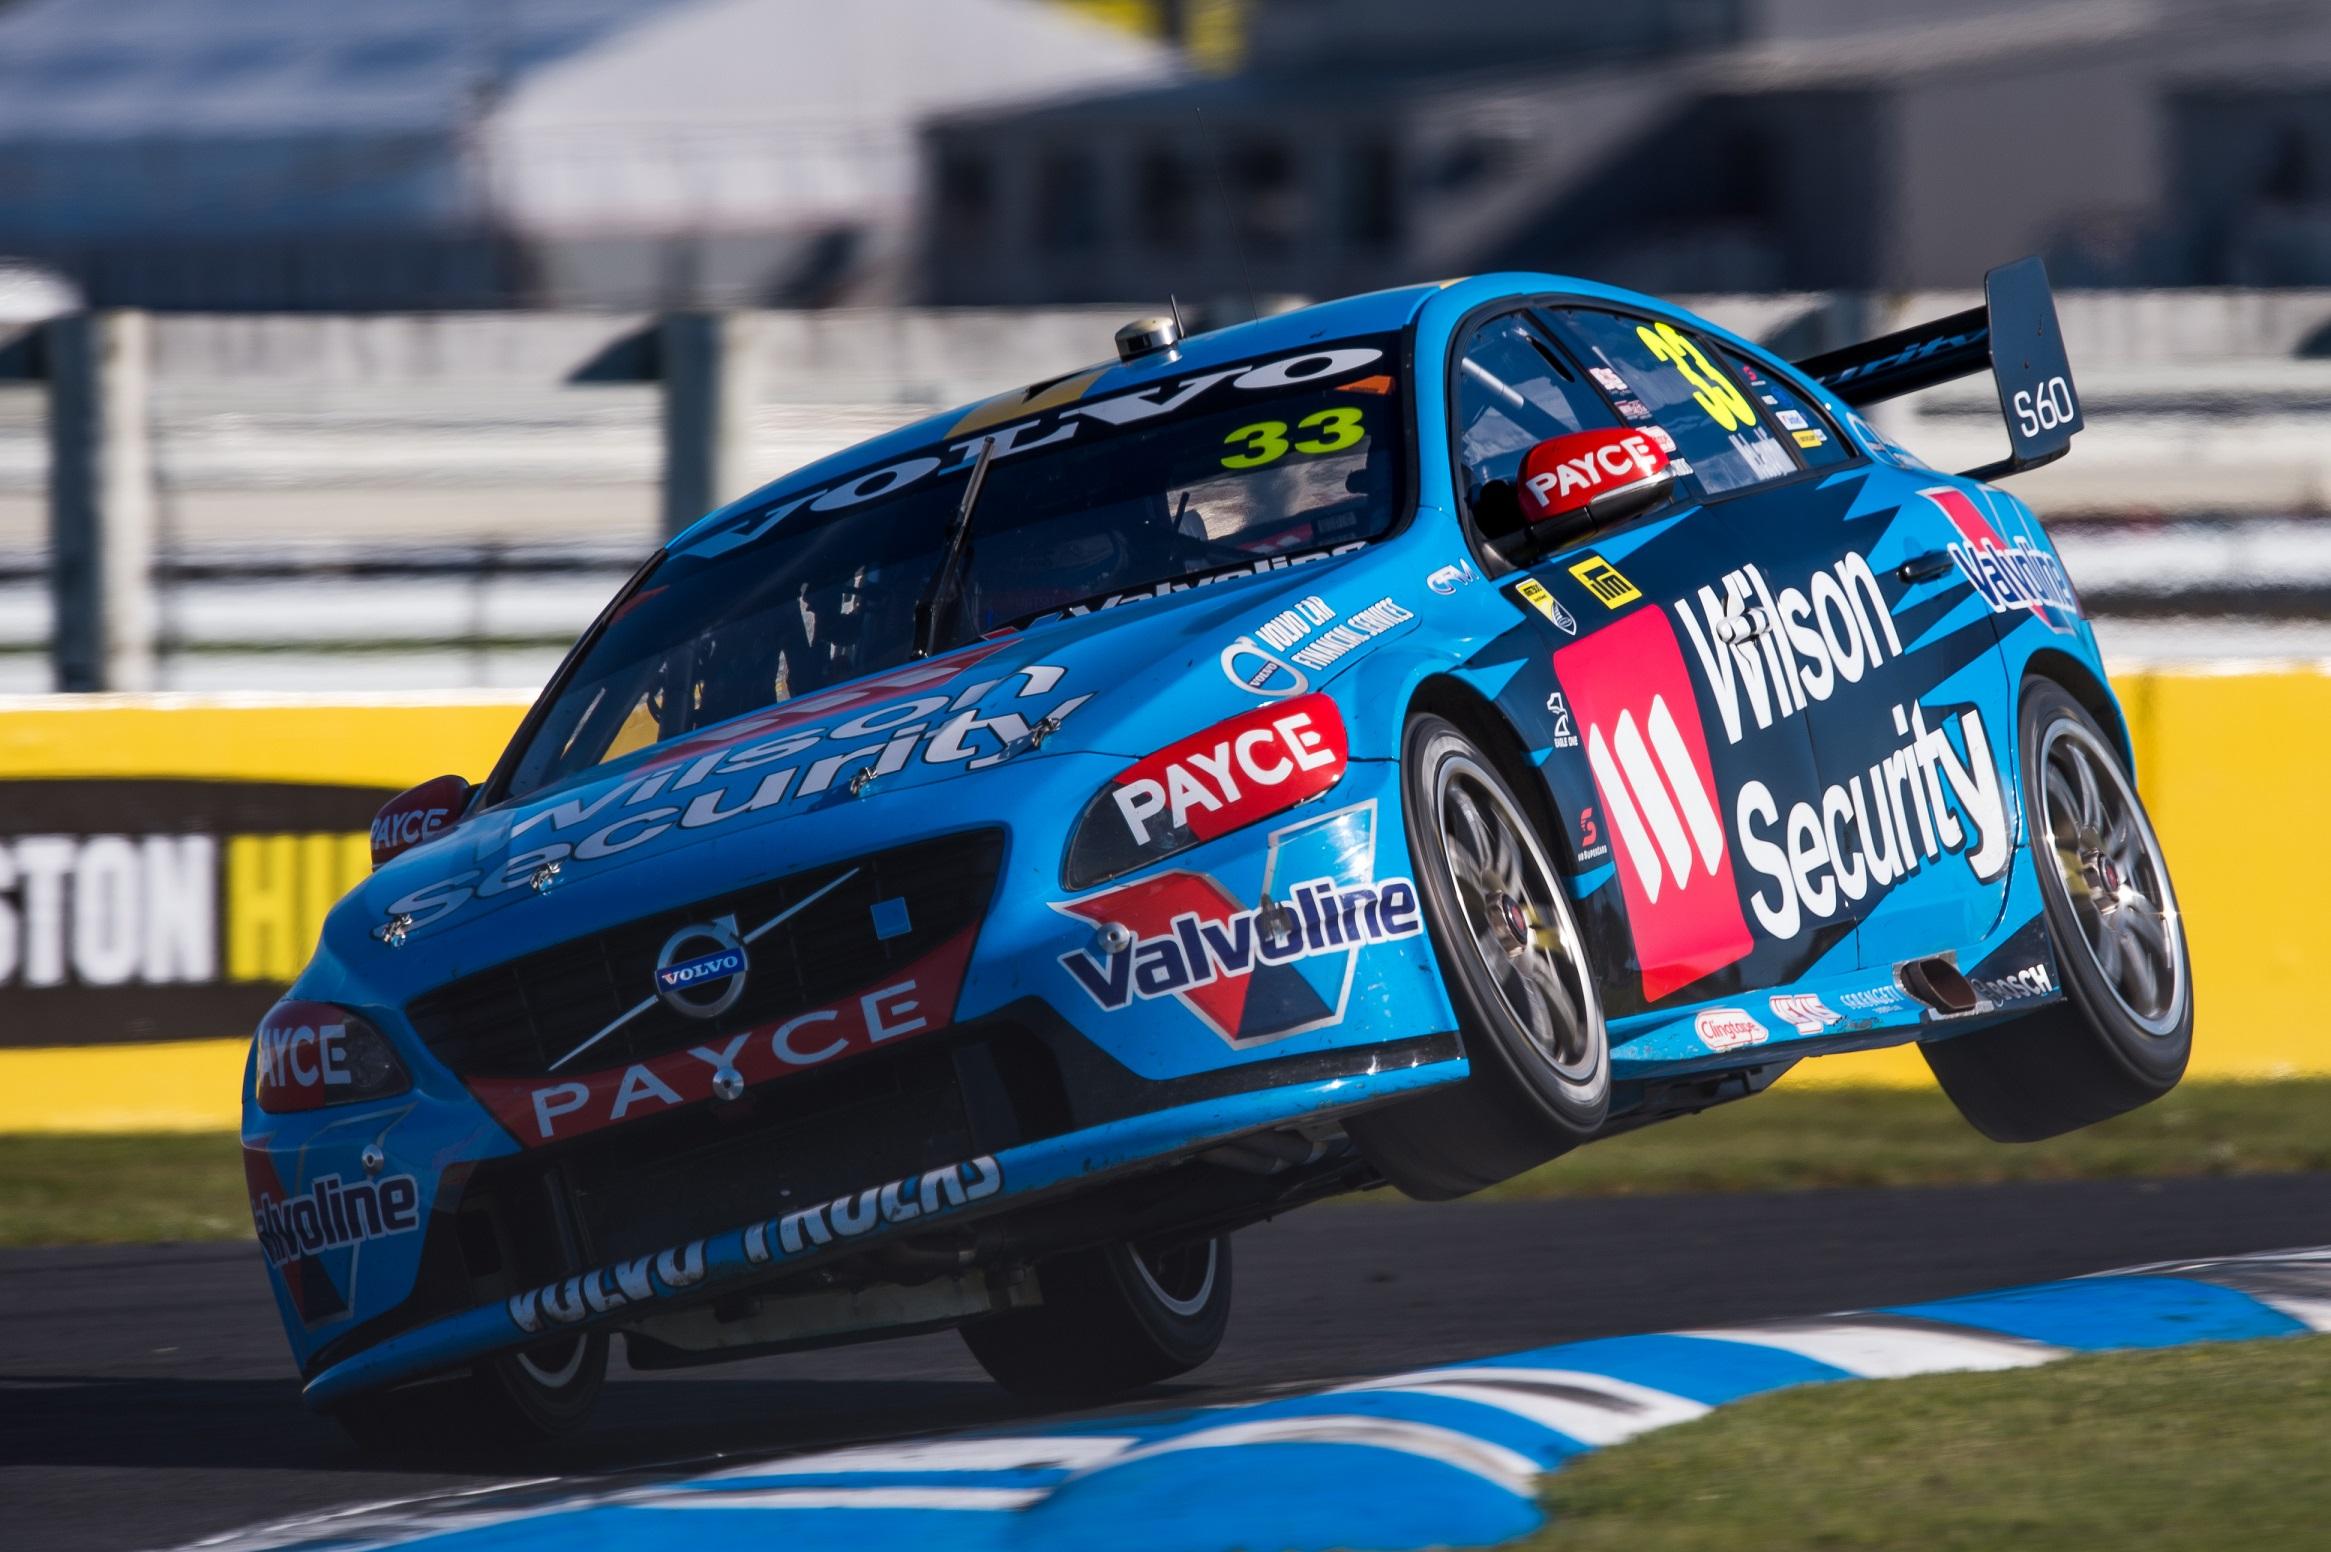 Scott Mclaughlin Chasing Win For Volvo At V8 Supercars Finale The Deadline Network